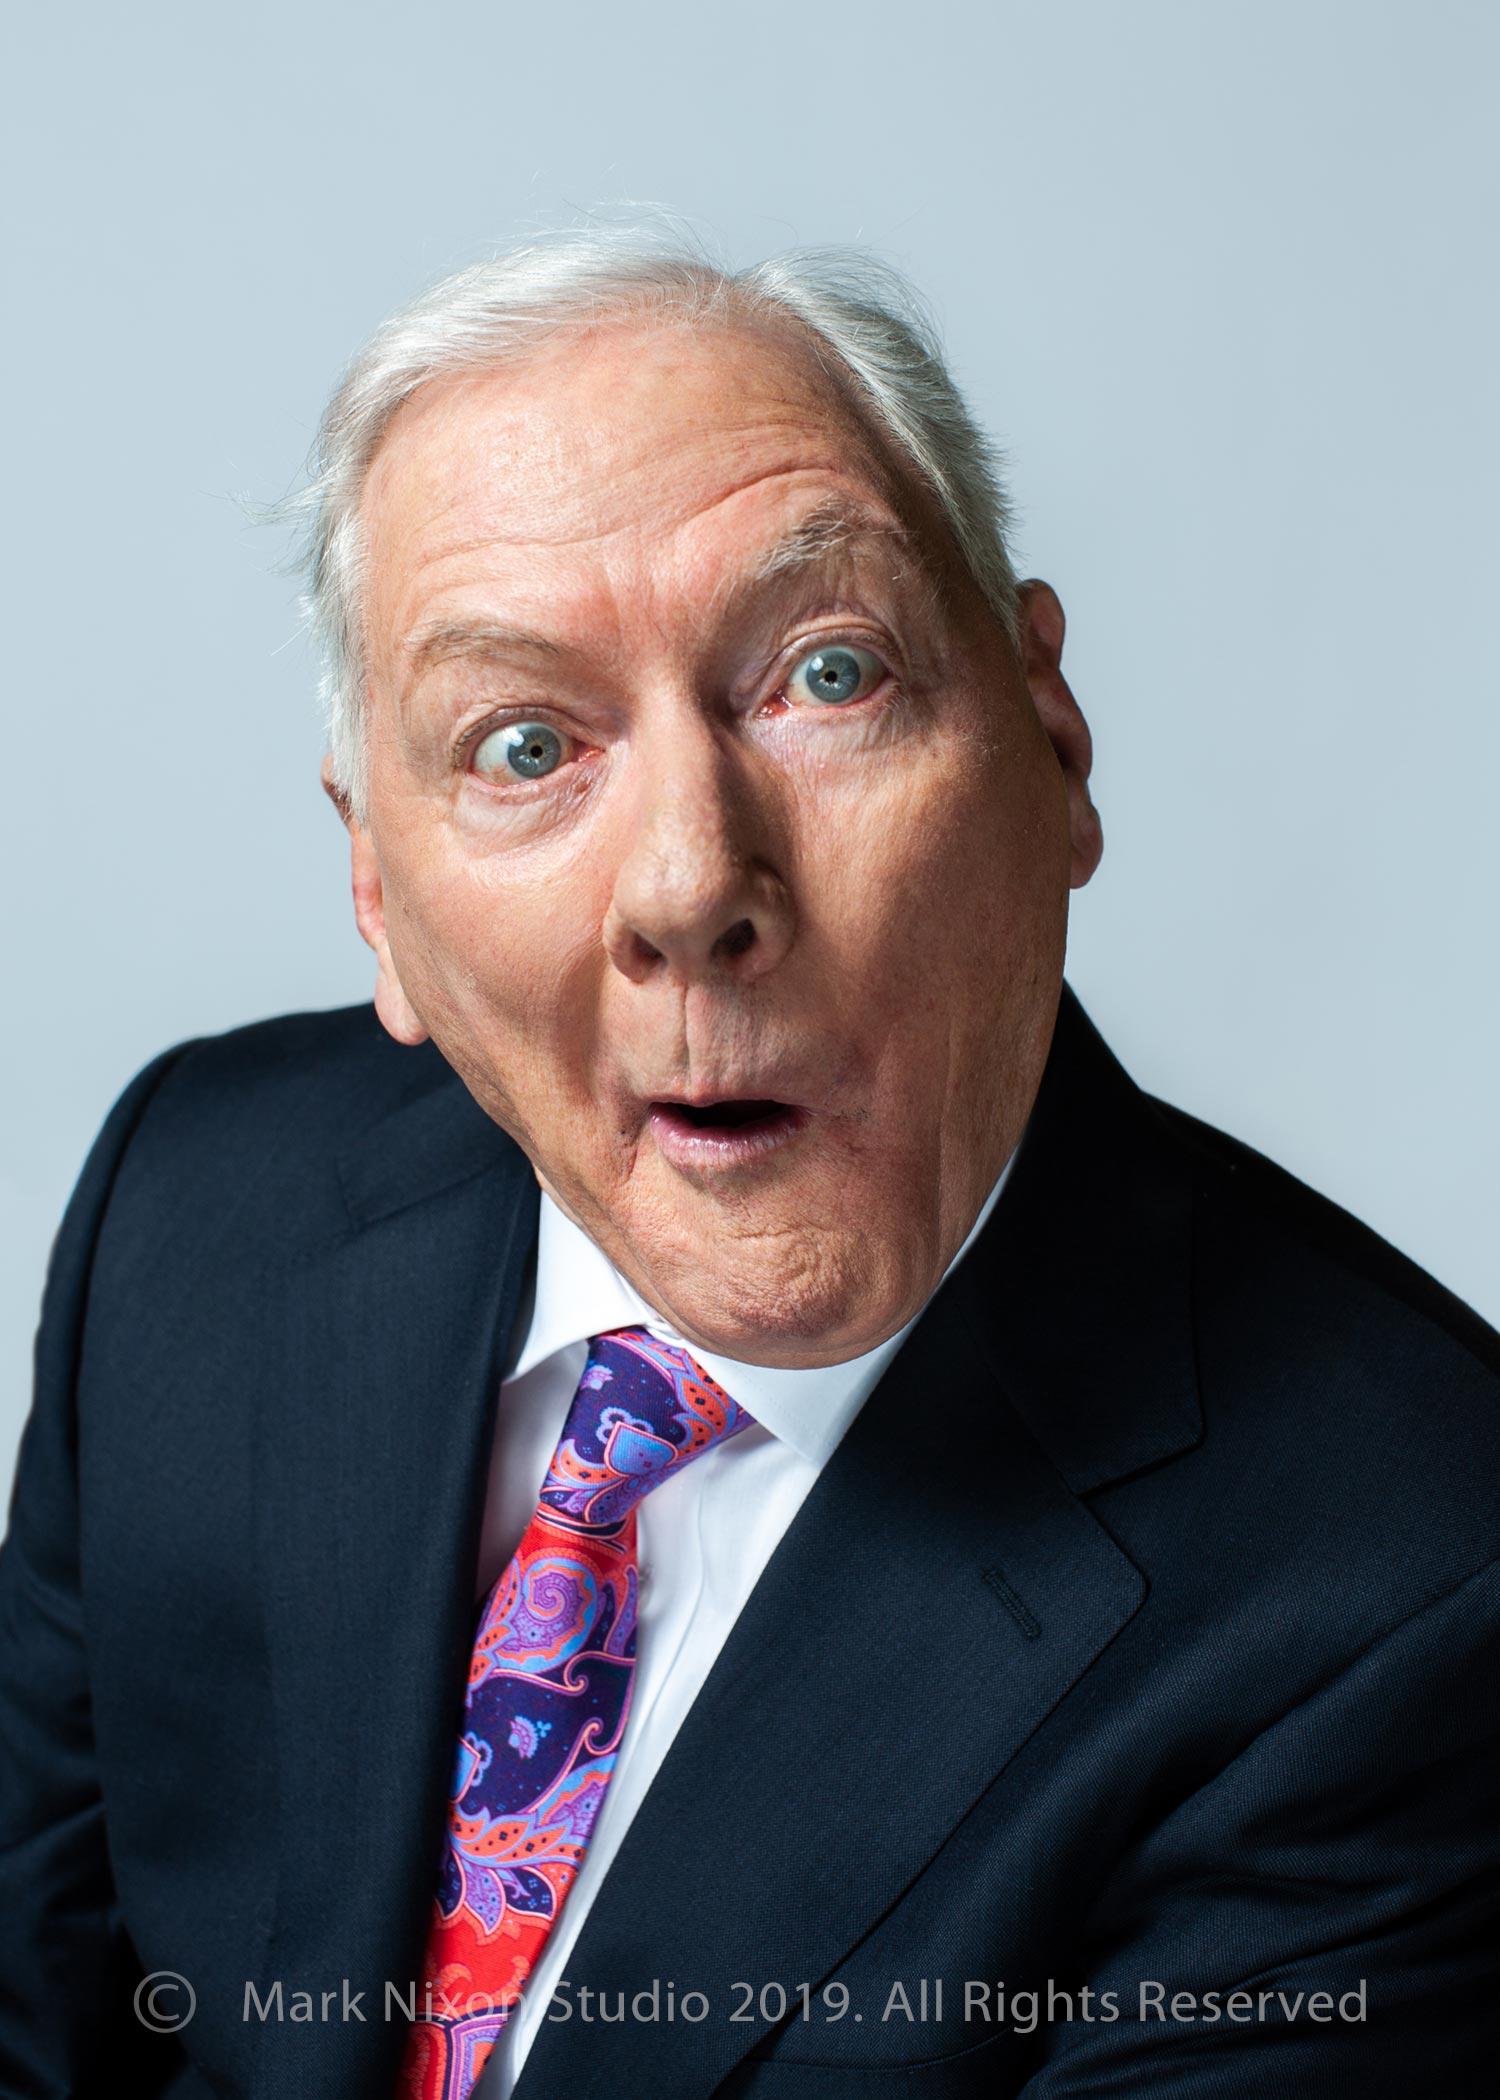 Gay-Byrne-Funny-Face-04.jpg